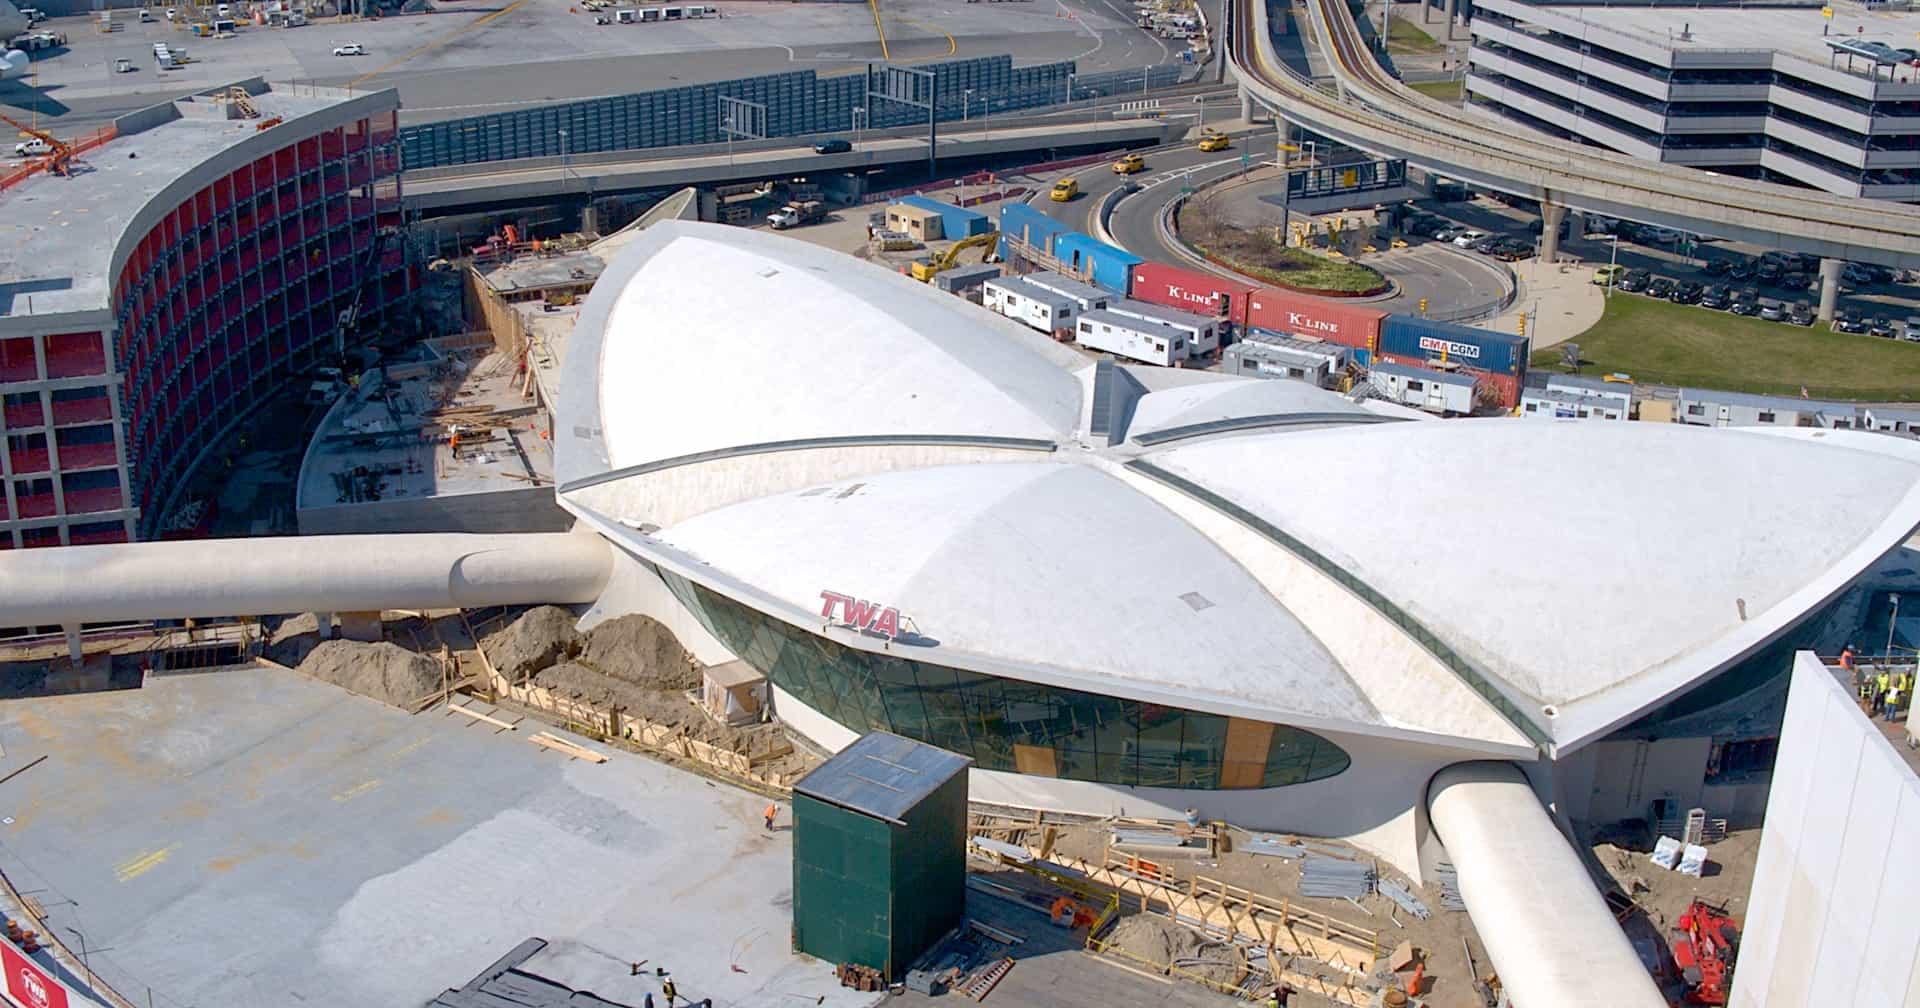 JFK Drone Flight-Cinematic Aerospace